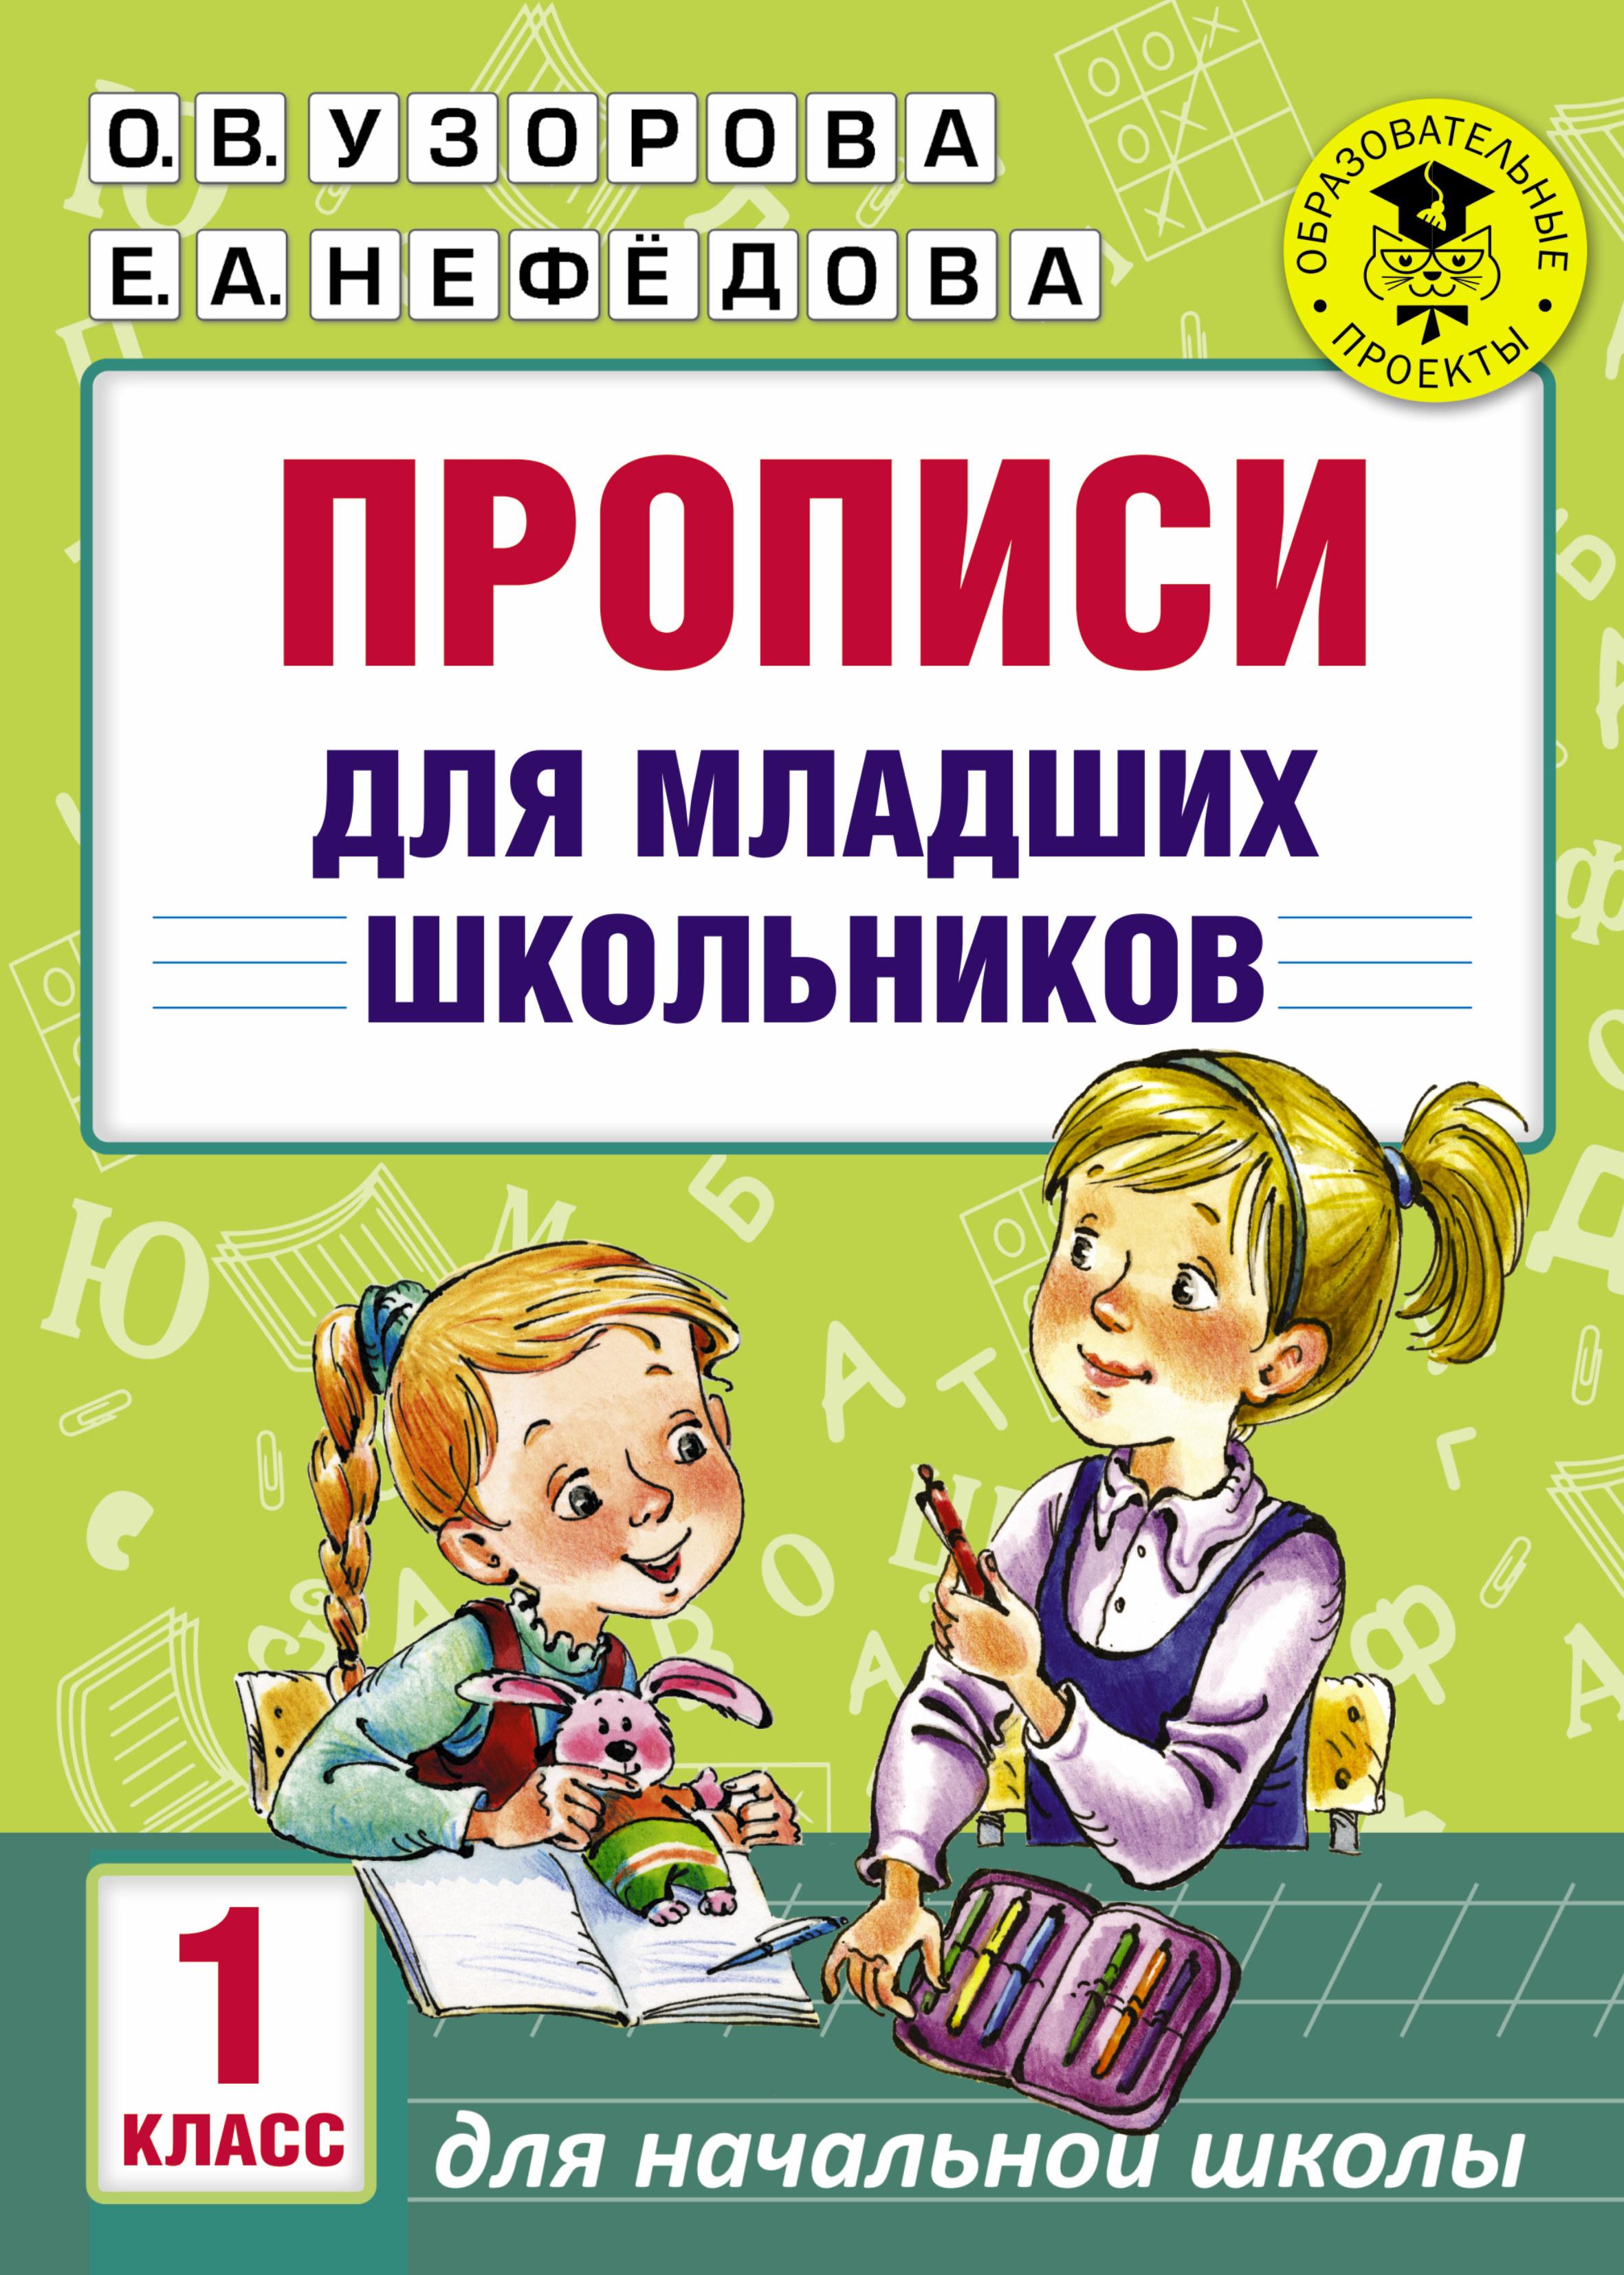 Прописи для младших школьников ( Узорова О.В., Нефедова Е.А.  )